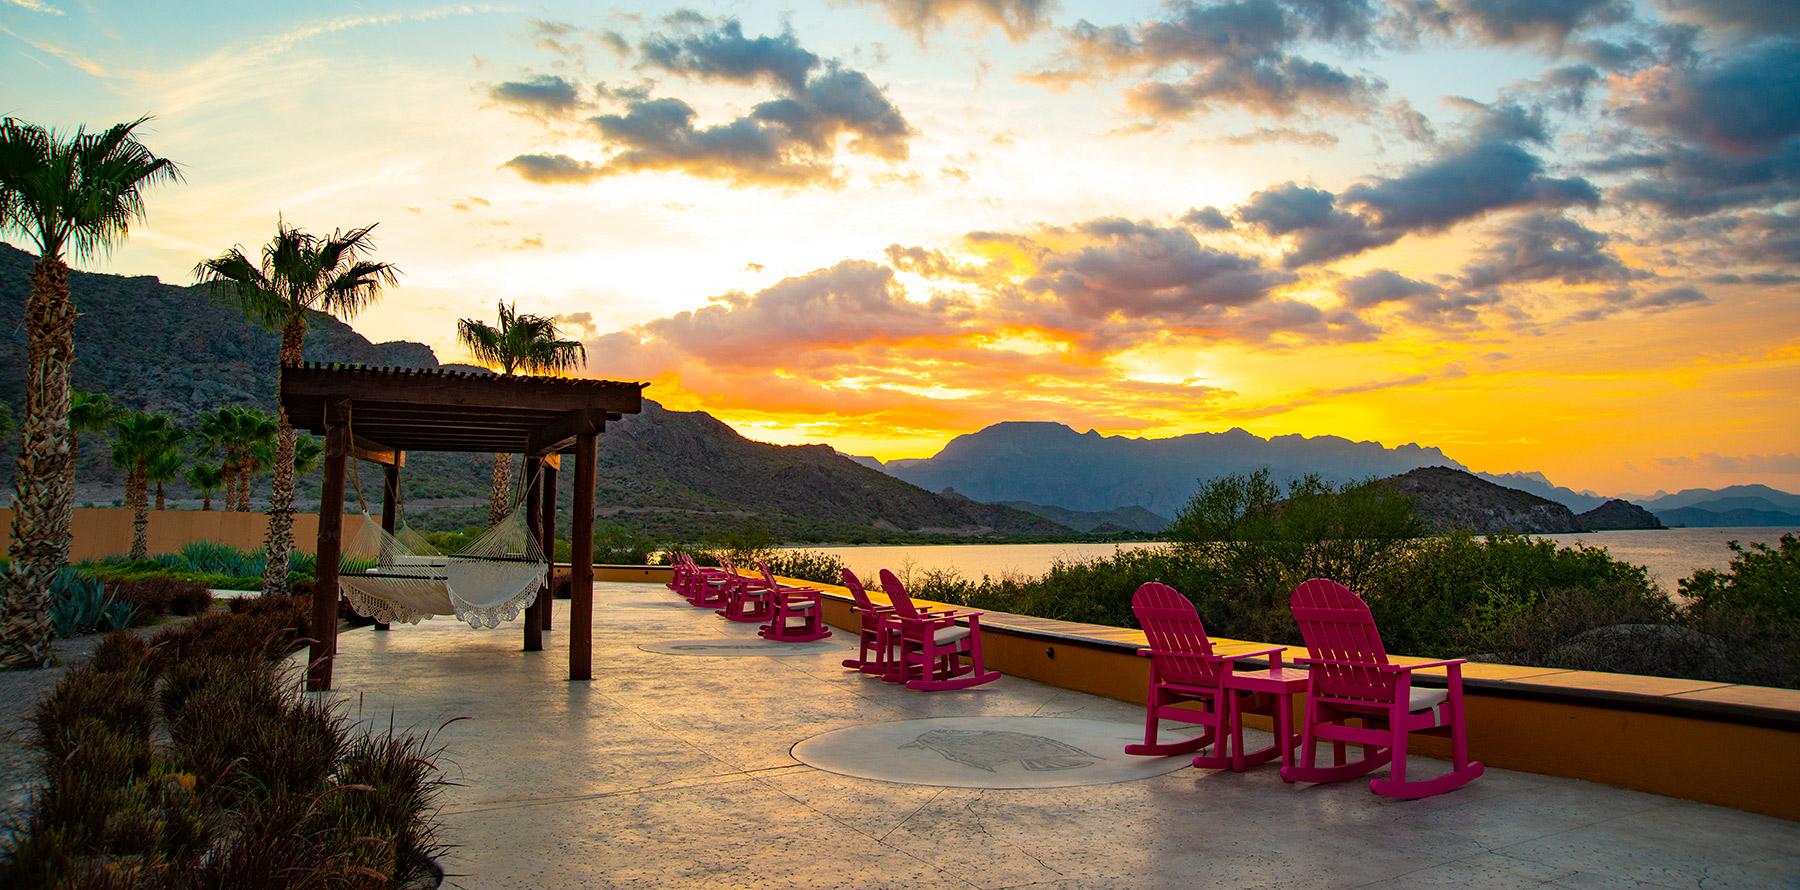 Villa-del-Palma-Loreto-Mexico-Carl-Kravats-Photography